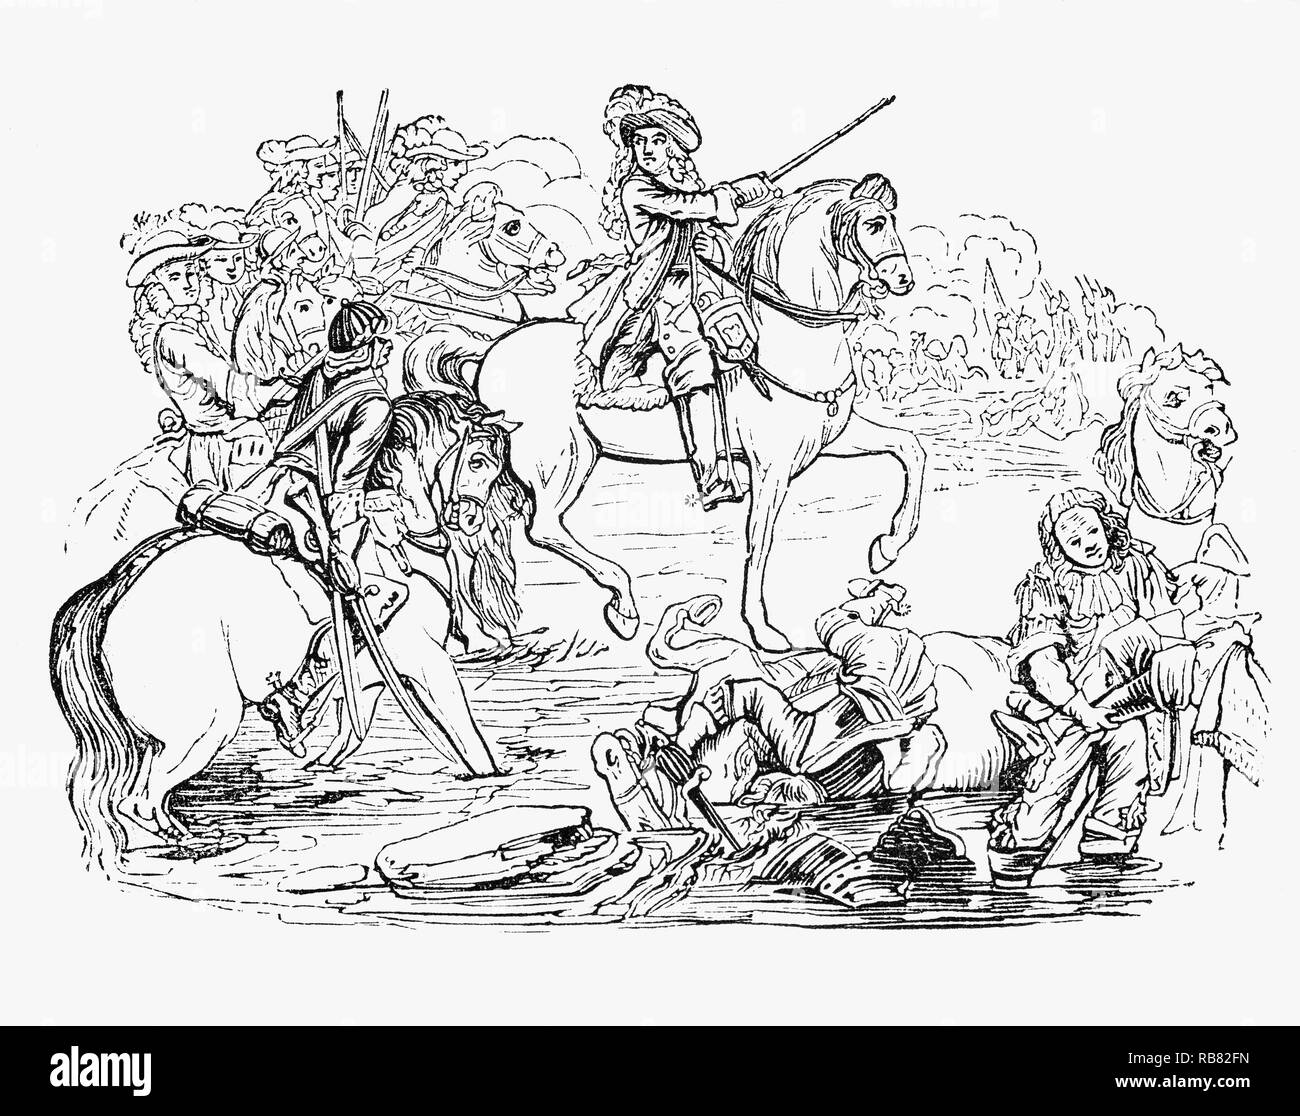 Battle Of The Boyne Stock Photos & Battle Of The Boyne Stock Images